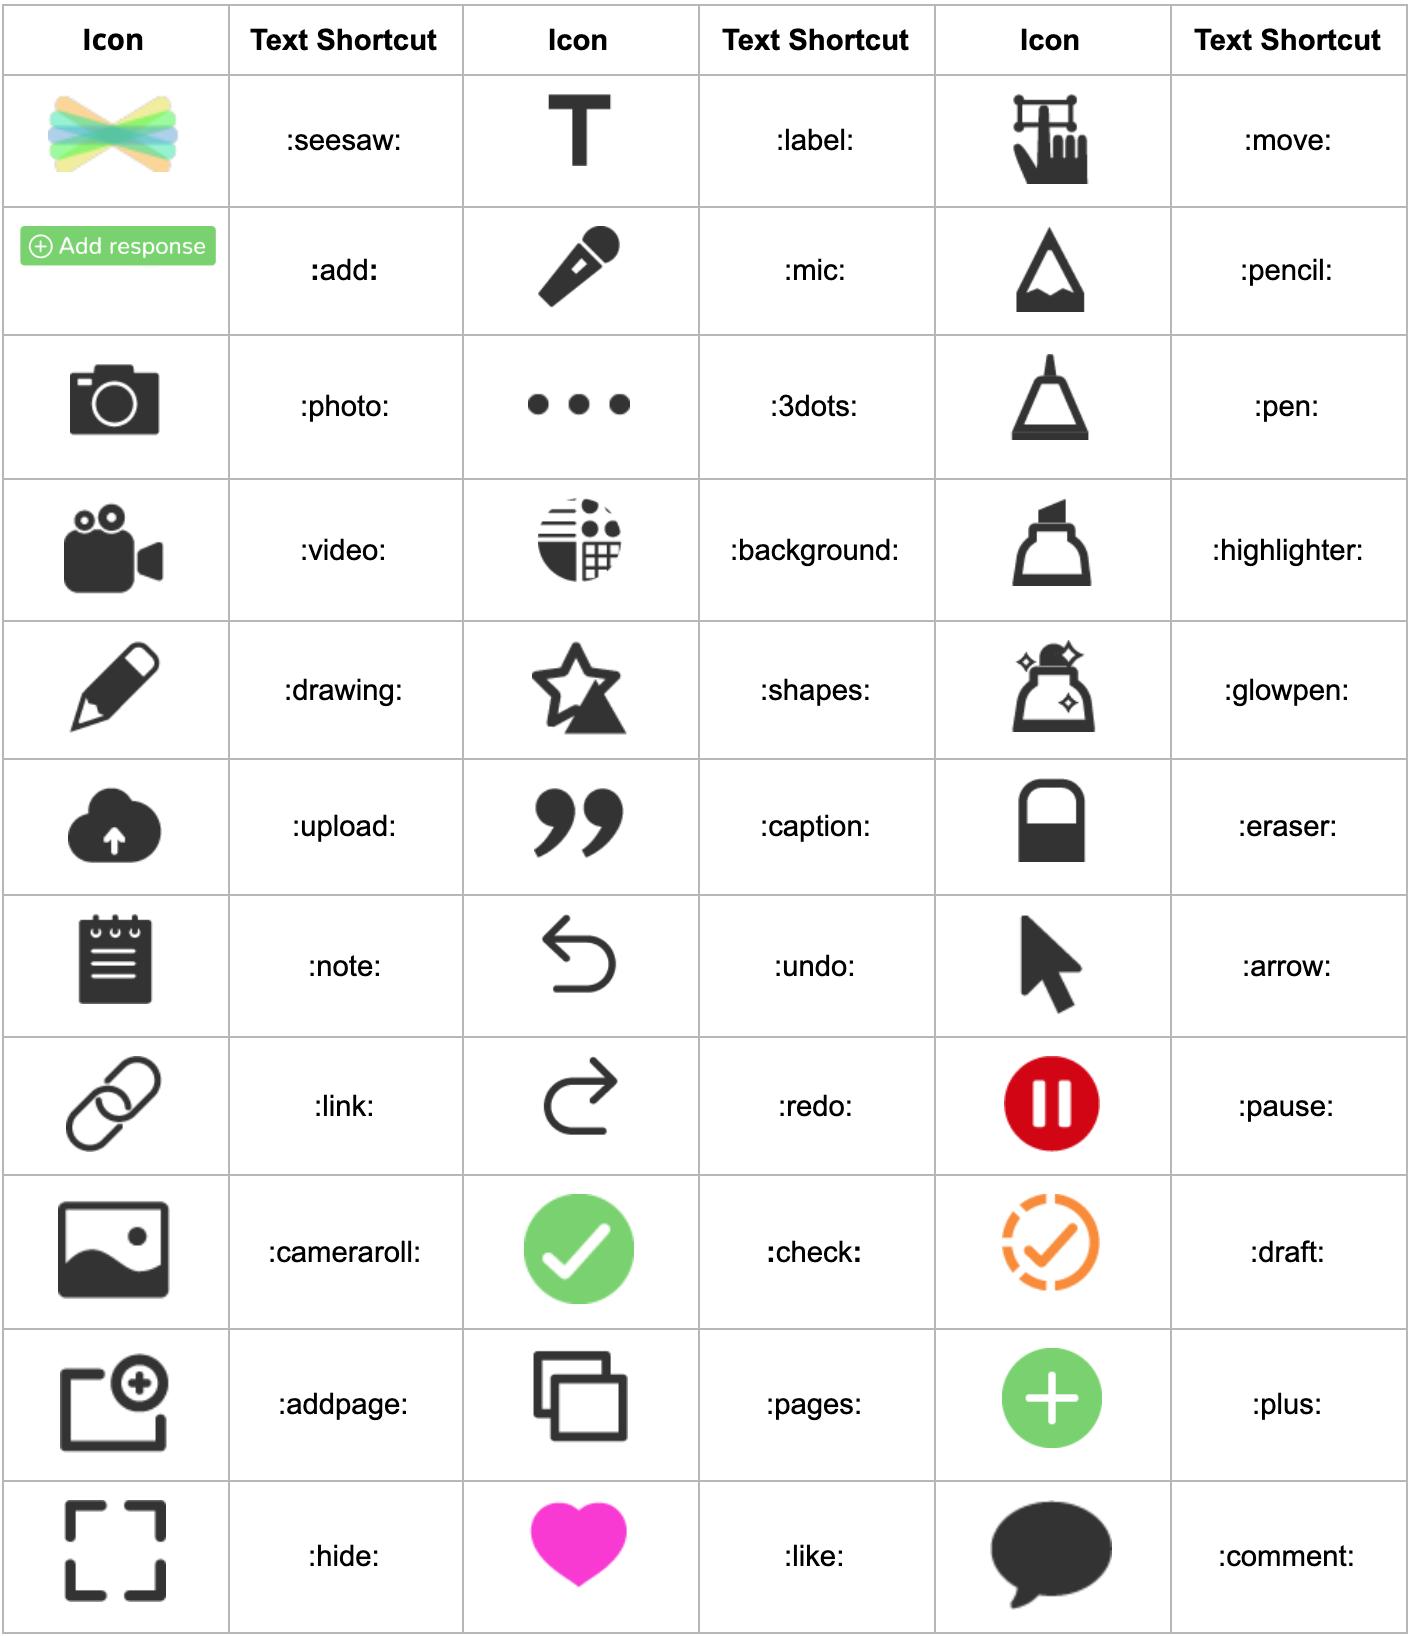 Seesaw Icon Shortcut